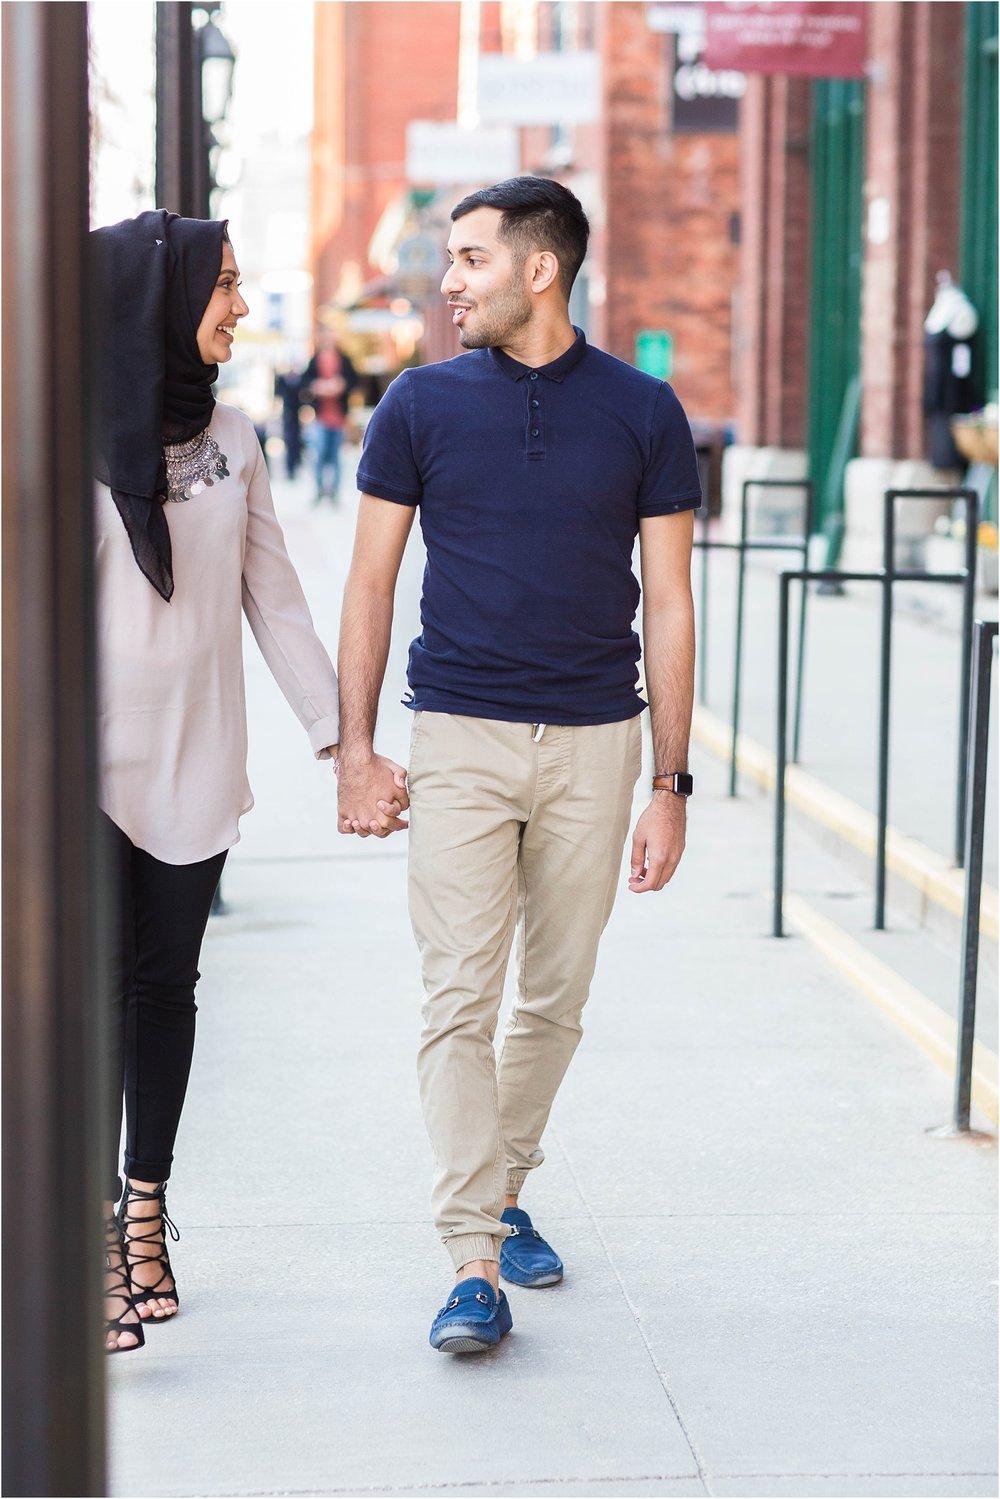 Distillery-District-Humber-Bay-Park-Engagement-Toronto-Mississauga-Brampton-Scarborough-GTA-Pakistani-Indian-Wedding-Engagement-Photographer-Photography_0013.jpg